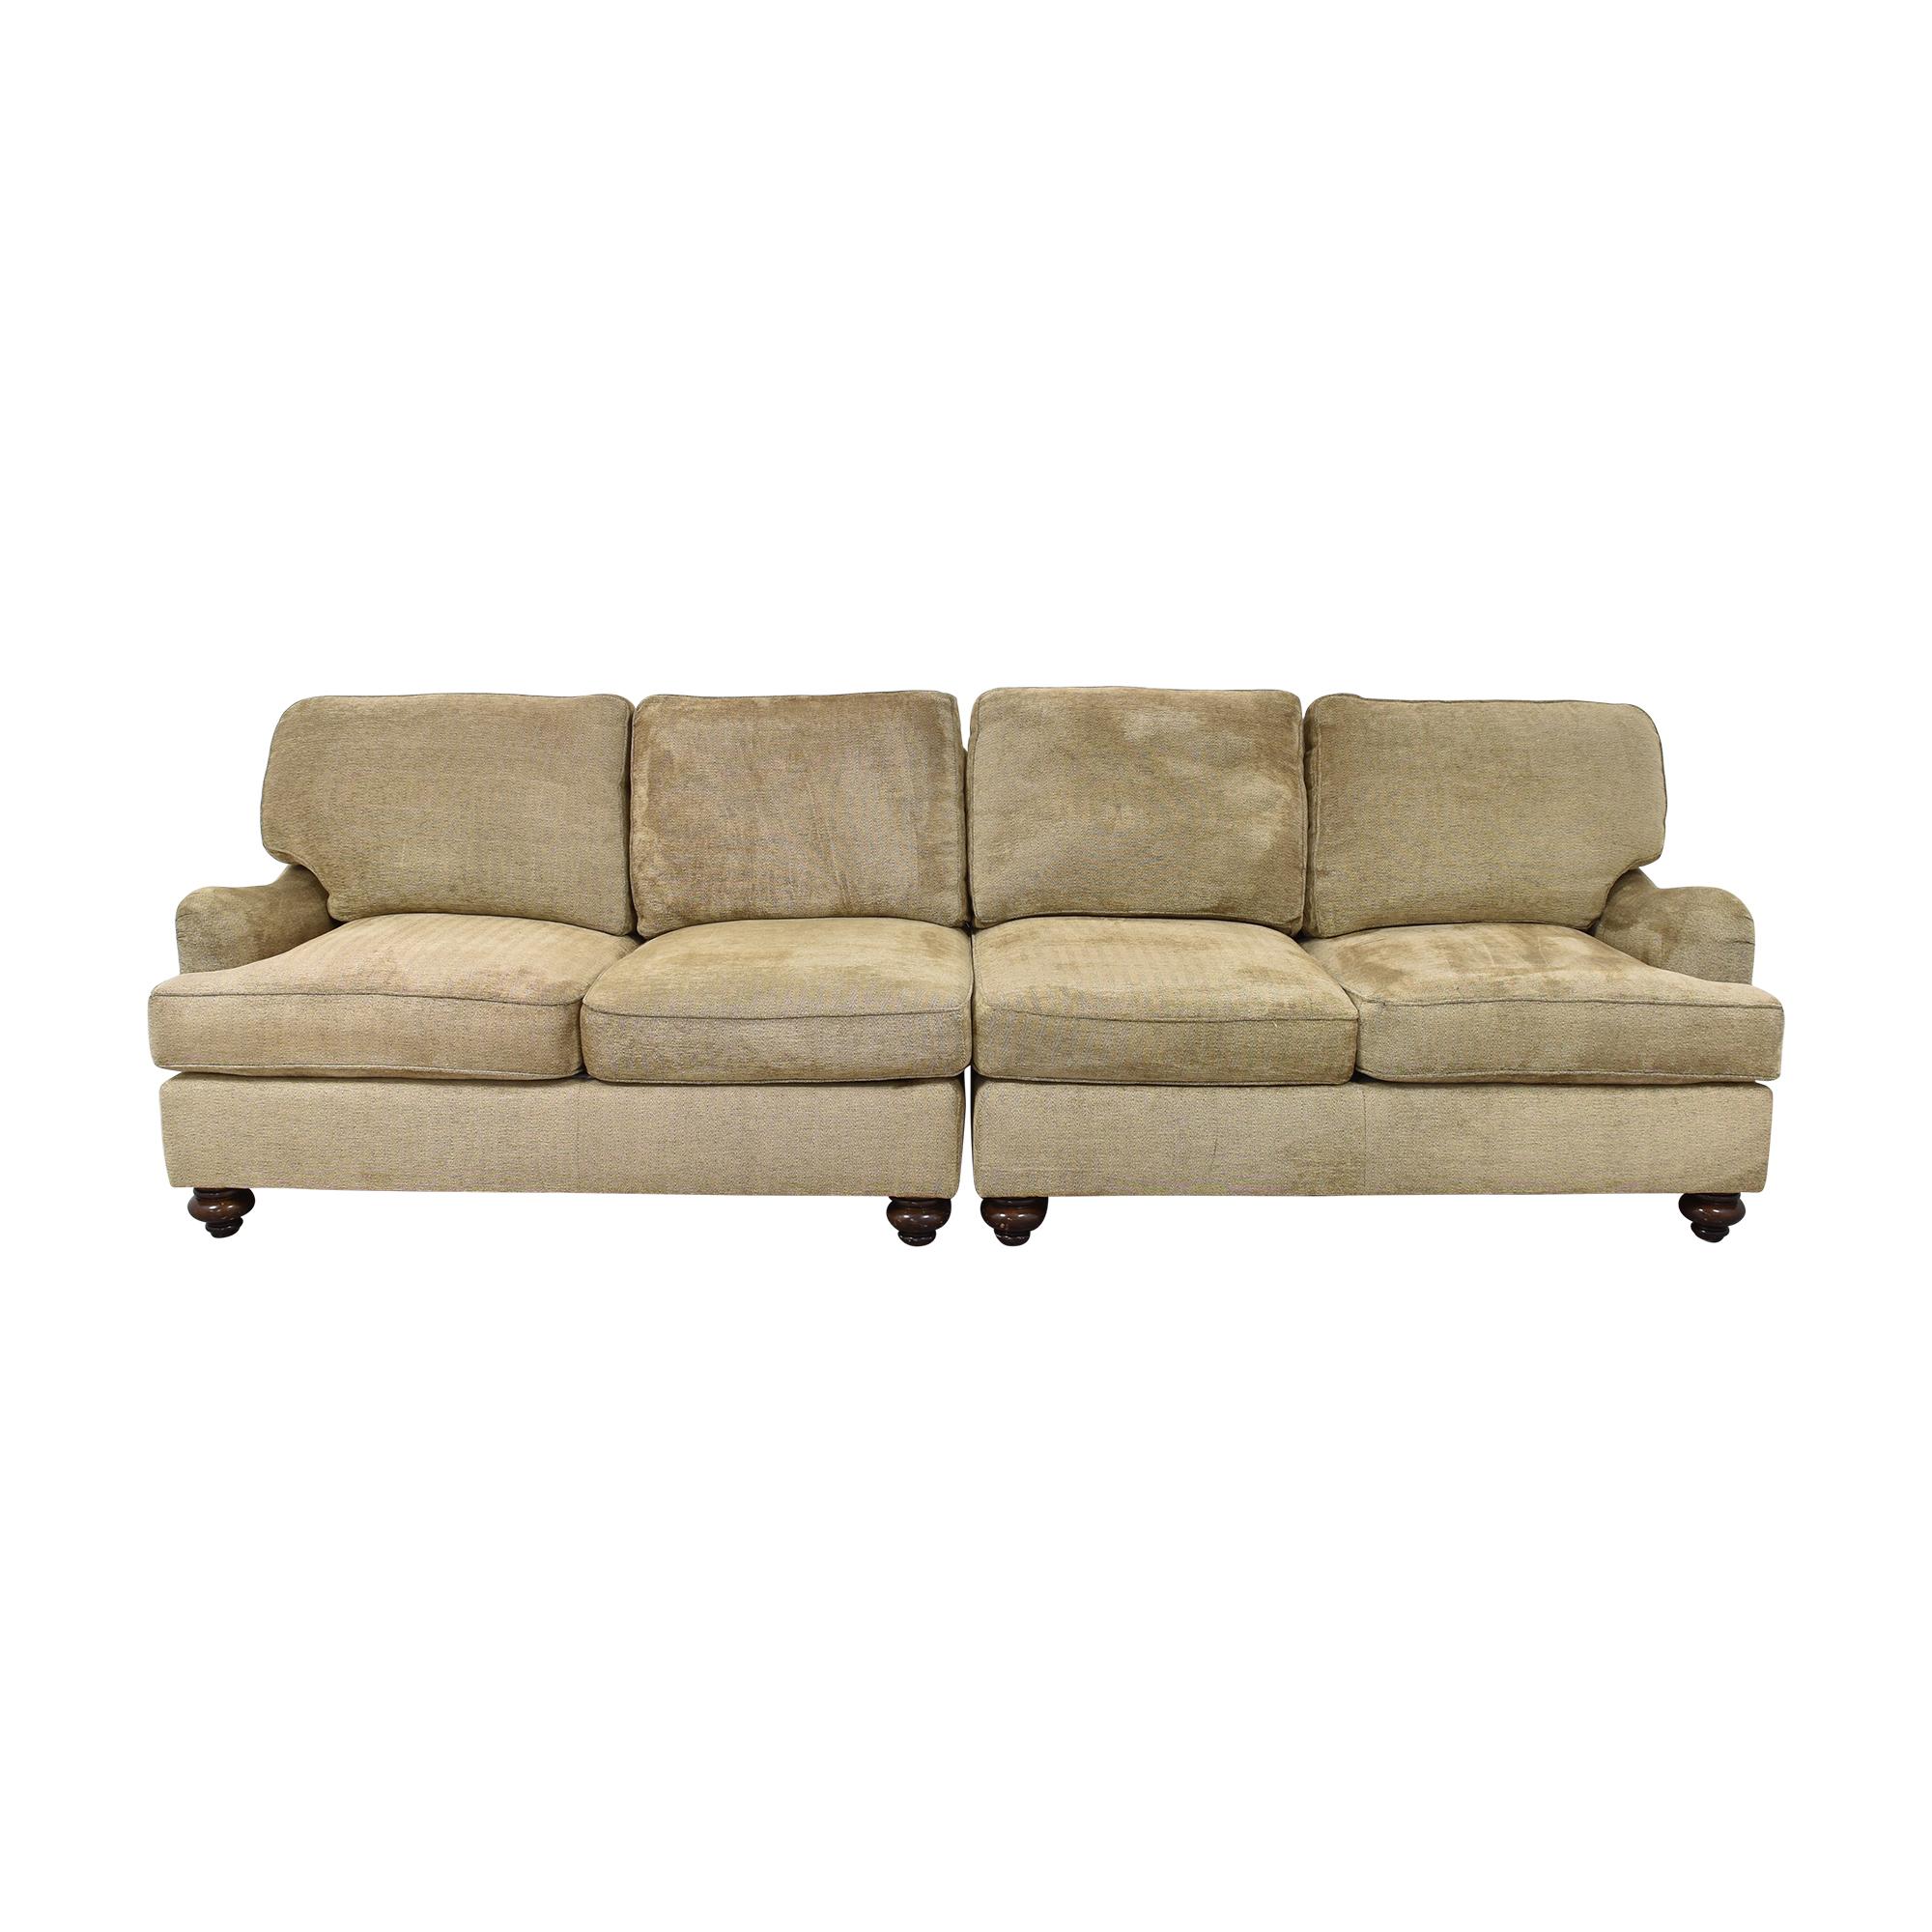 Henredon Furniture Henredon Furniture Mid-Century Modern Couch pa